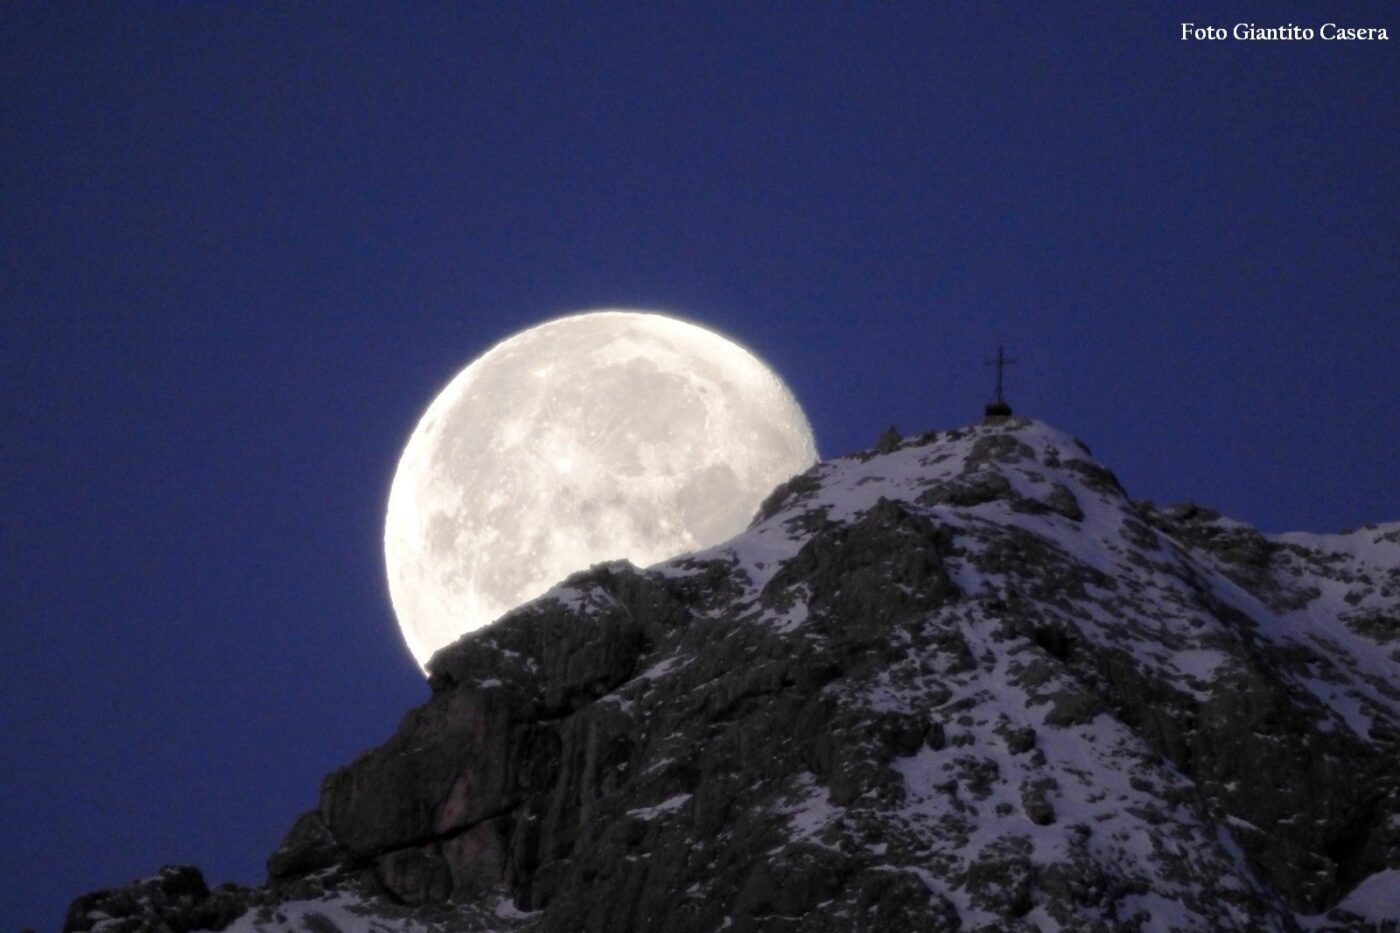 Luna tra i Monti Pallidi , Agner - Giantito Casera